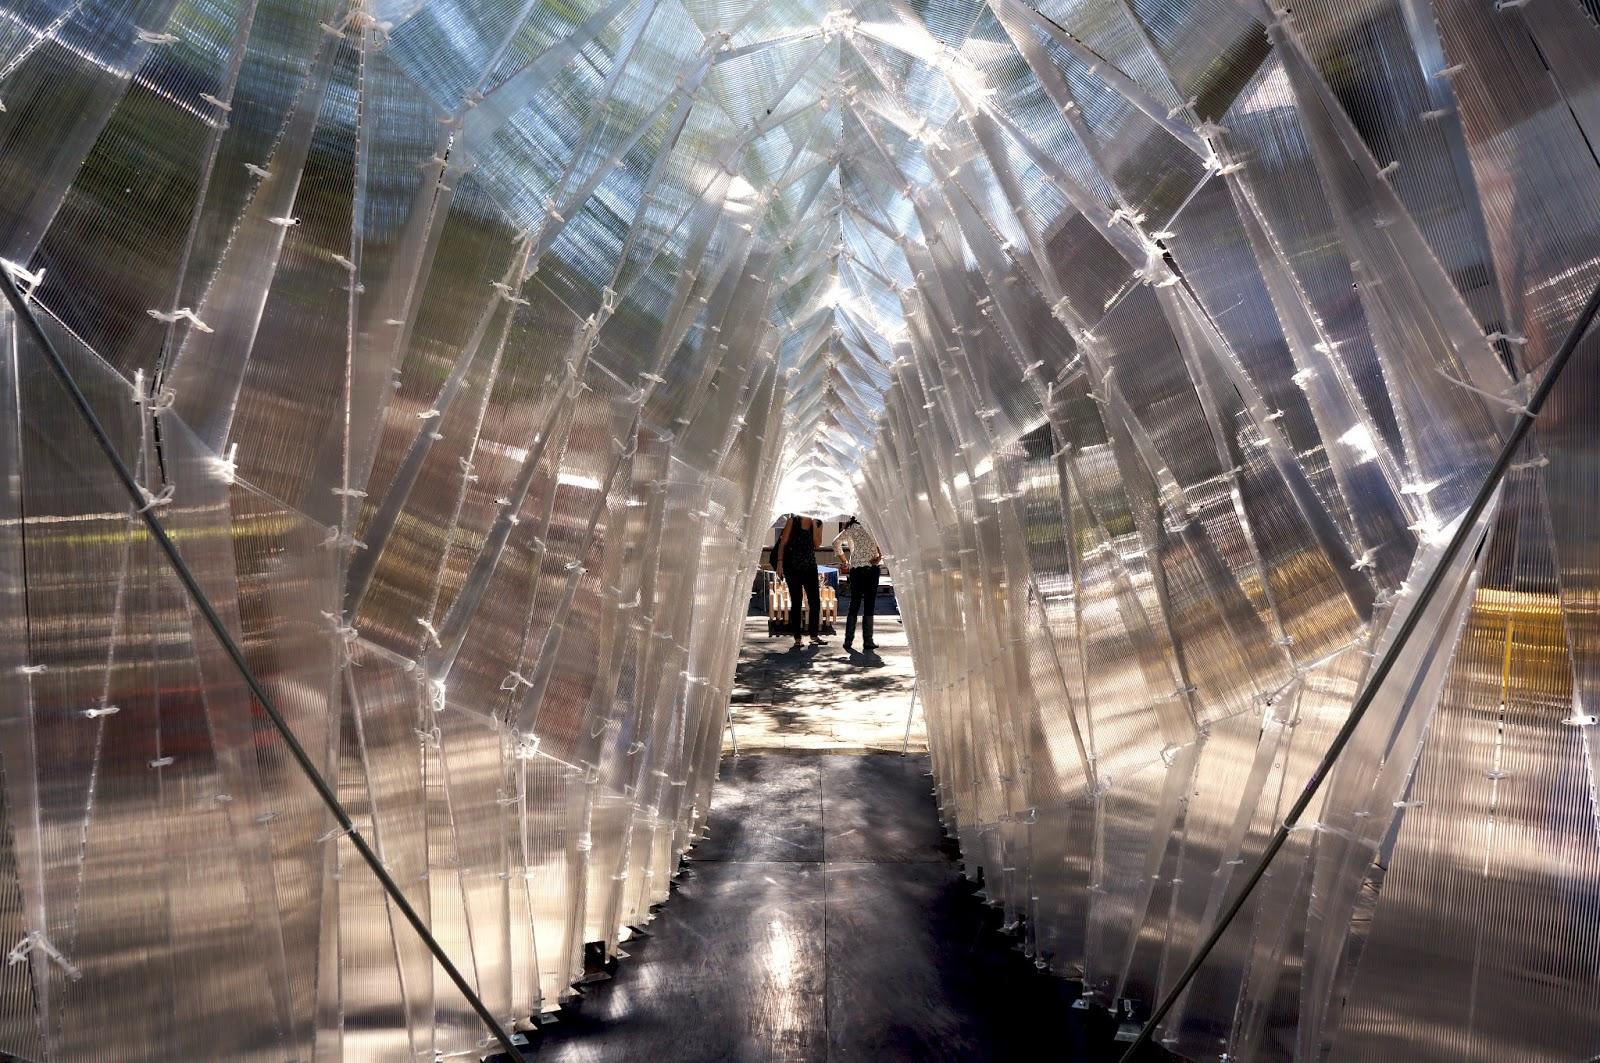 2b glass pavilion